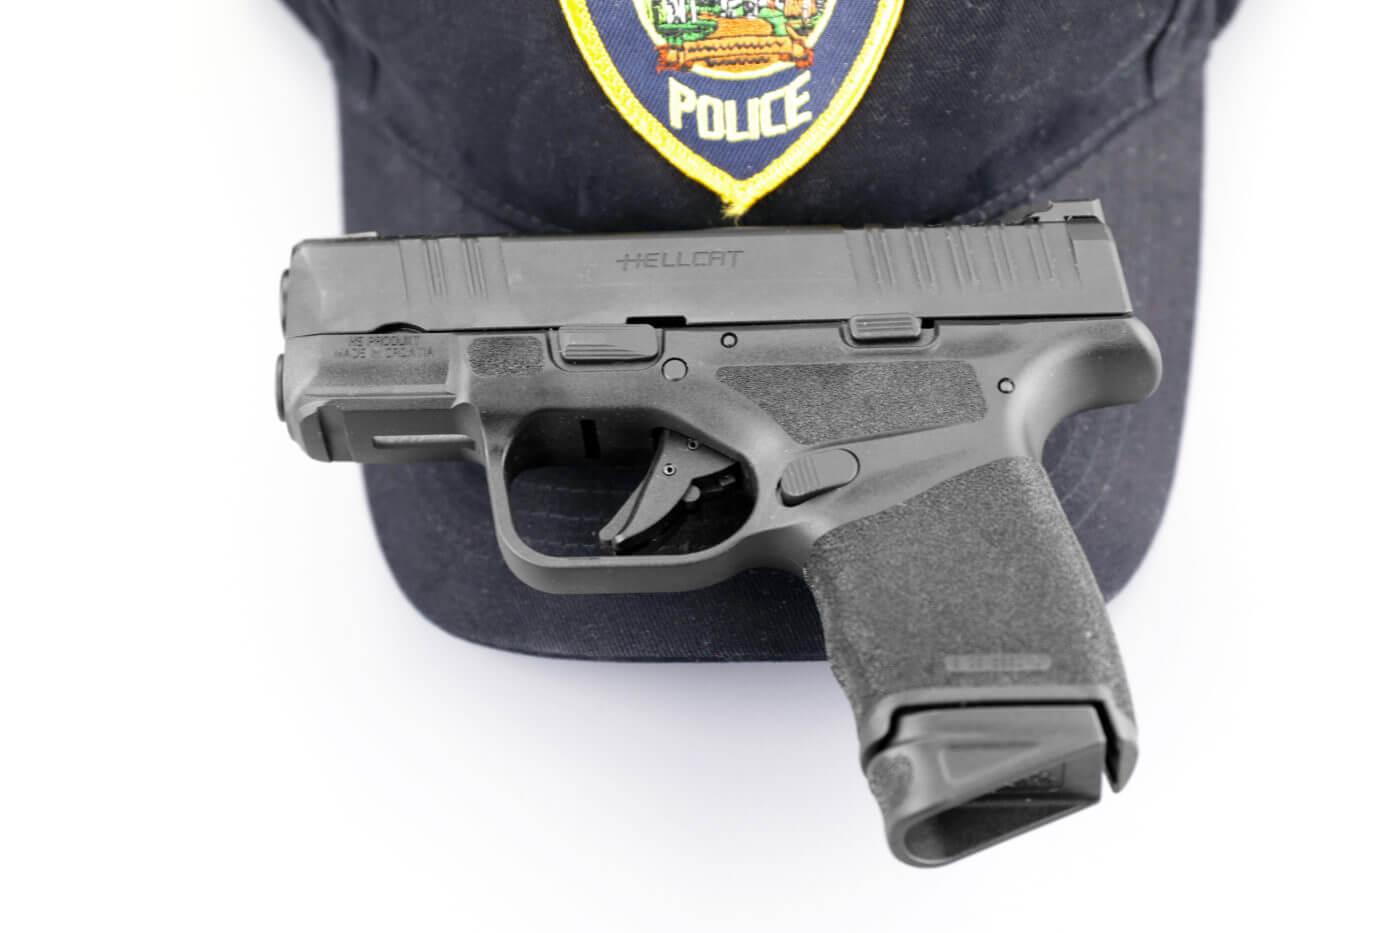 A police officer's backup gun